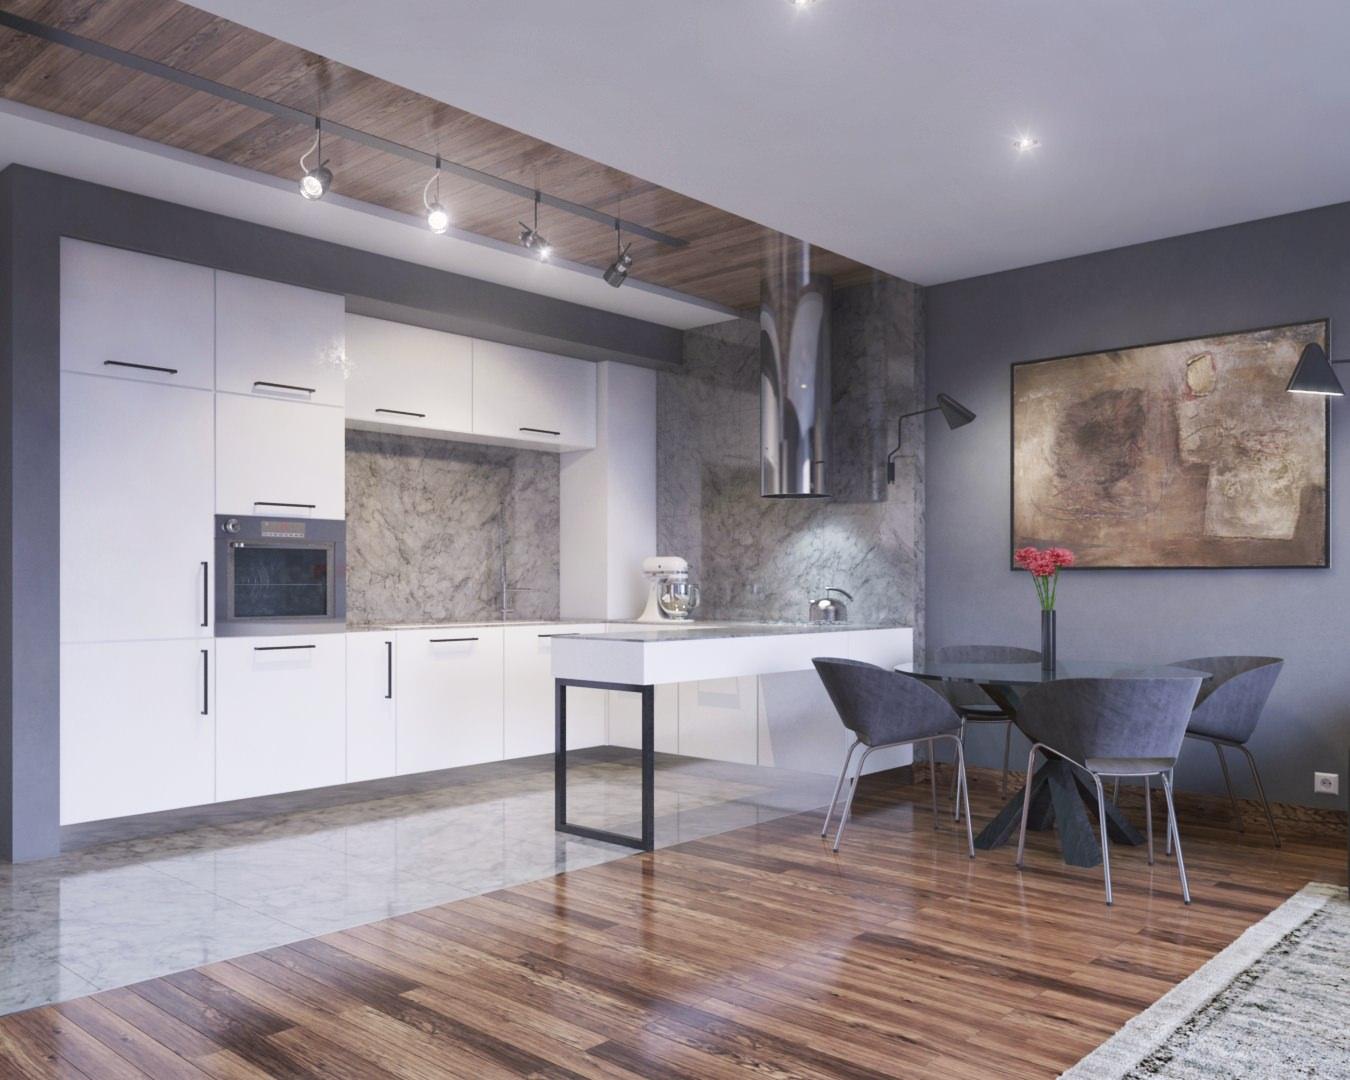 rendu 3D de cuisine design sur open space